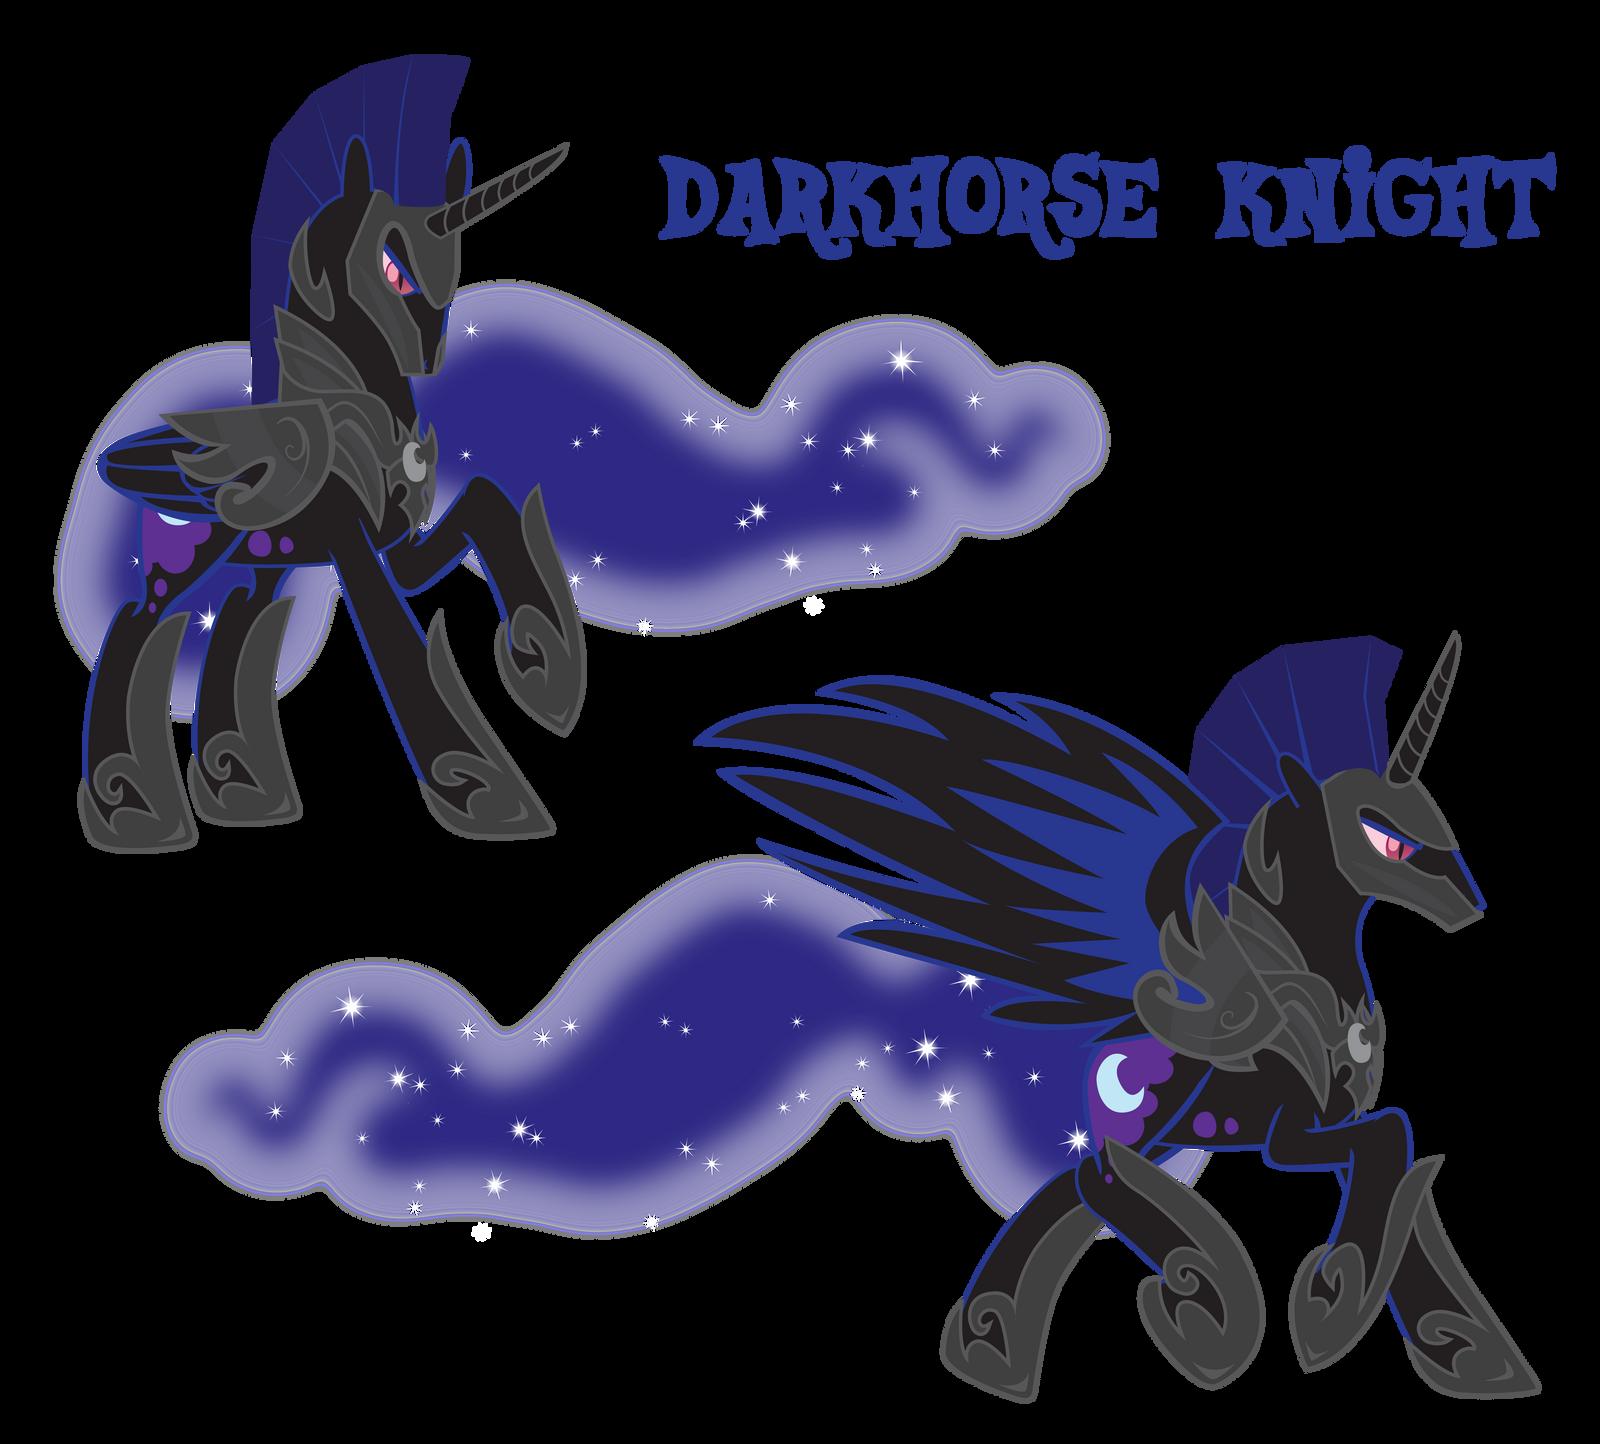 Profile:Darkhorse Knight by Trotsworth on DeviantArt